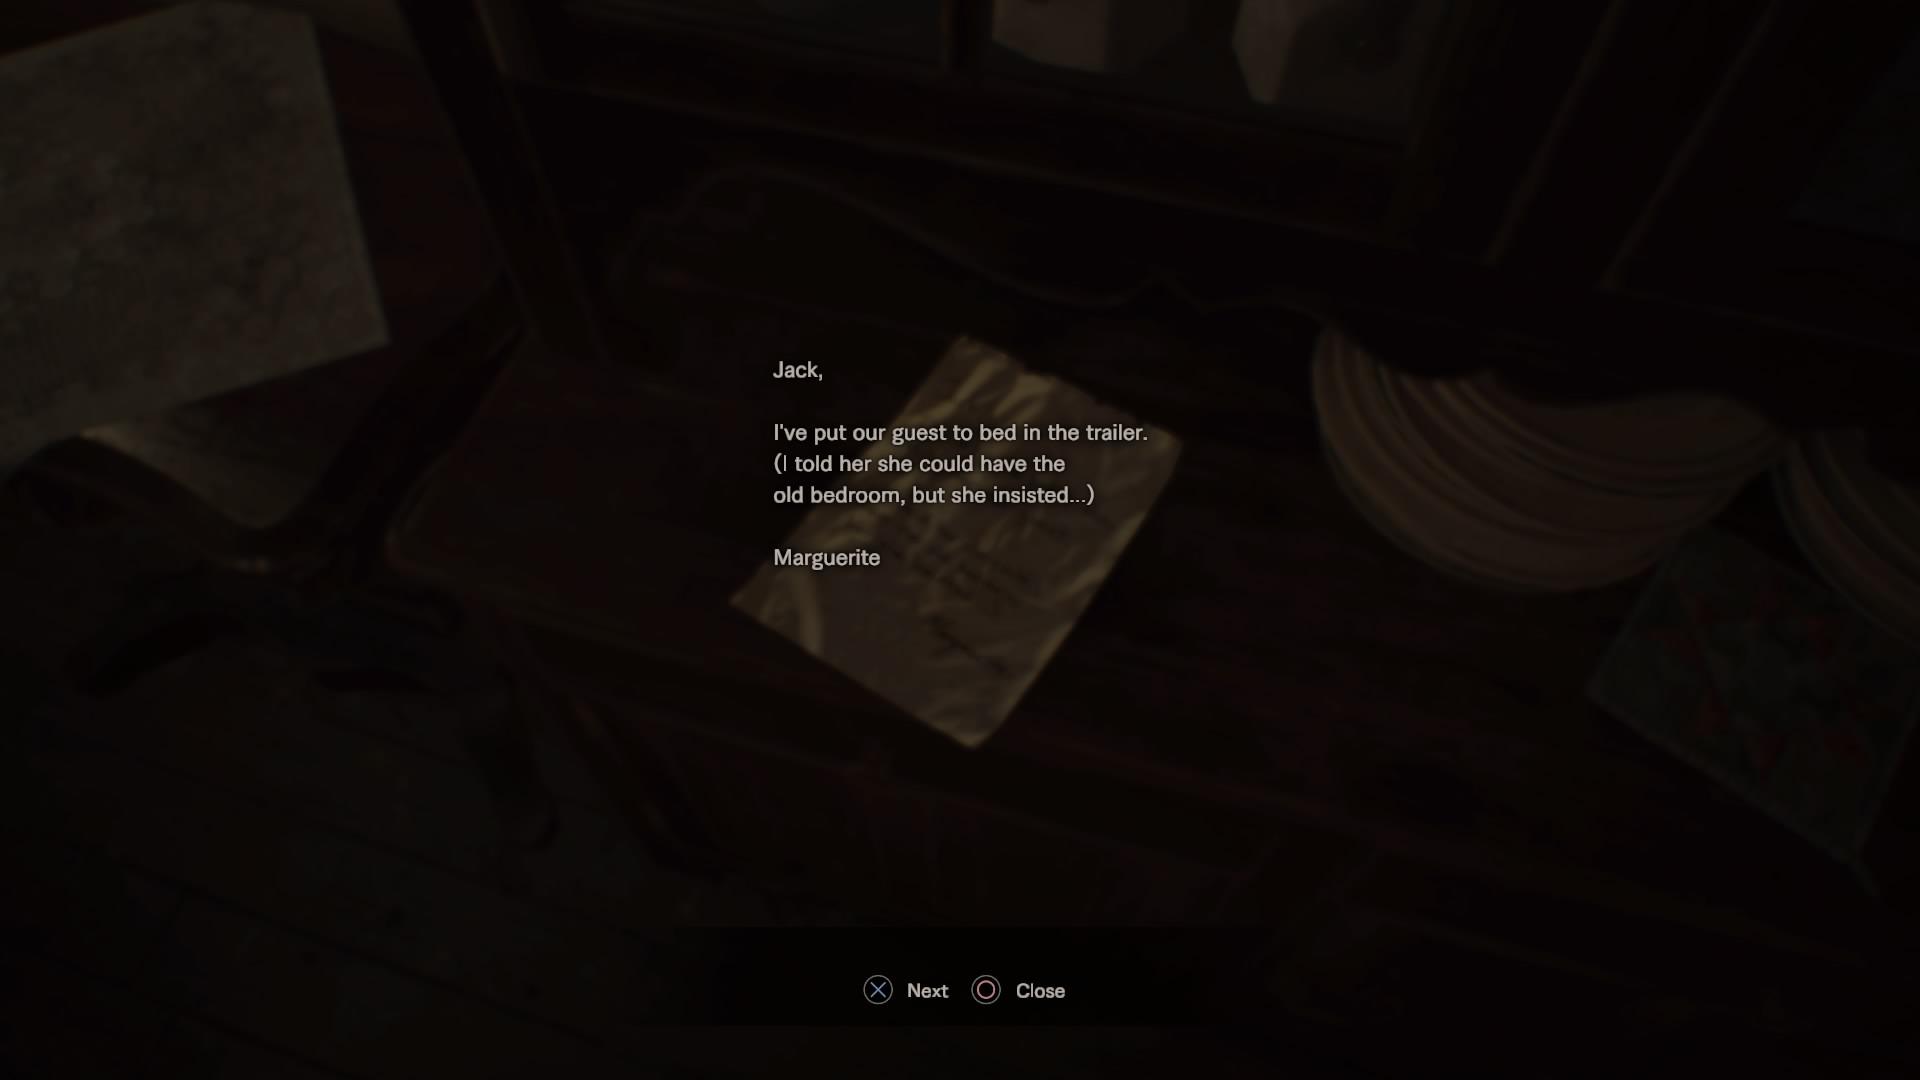 Marguerite's Note